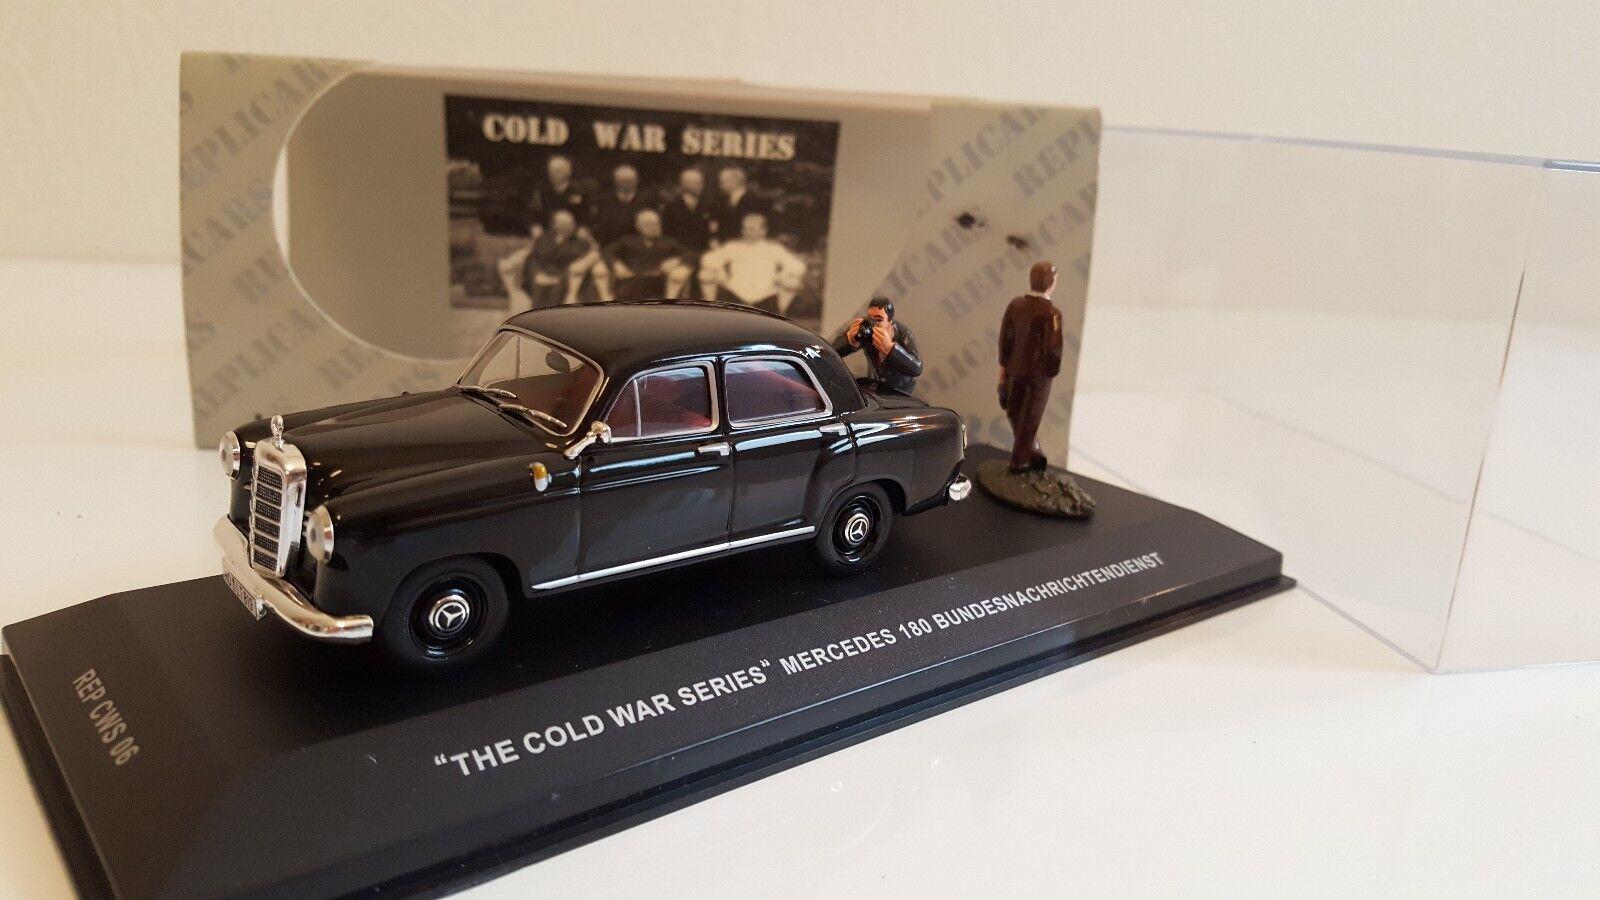 Ixo   Replivoitures  Cold War  Series  - Mercedes 180 Bundesnachrichtendienst (1 43)  pas cher en ligne